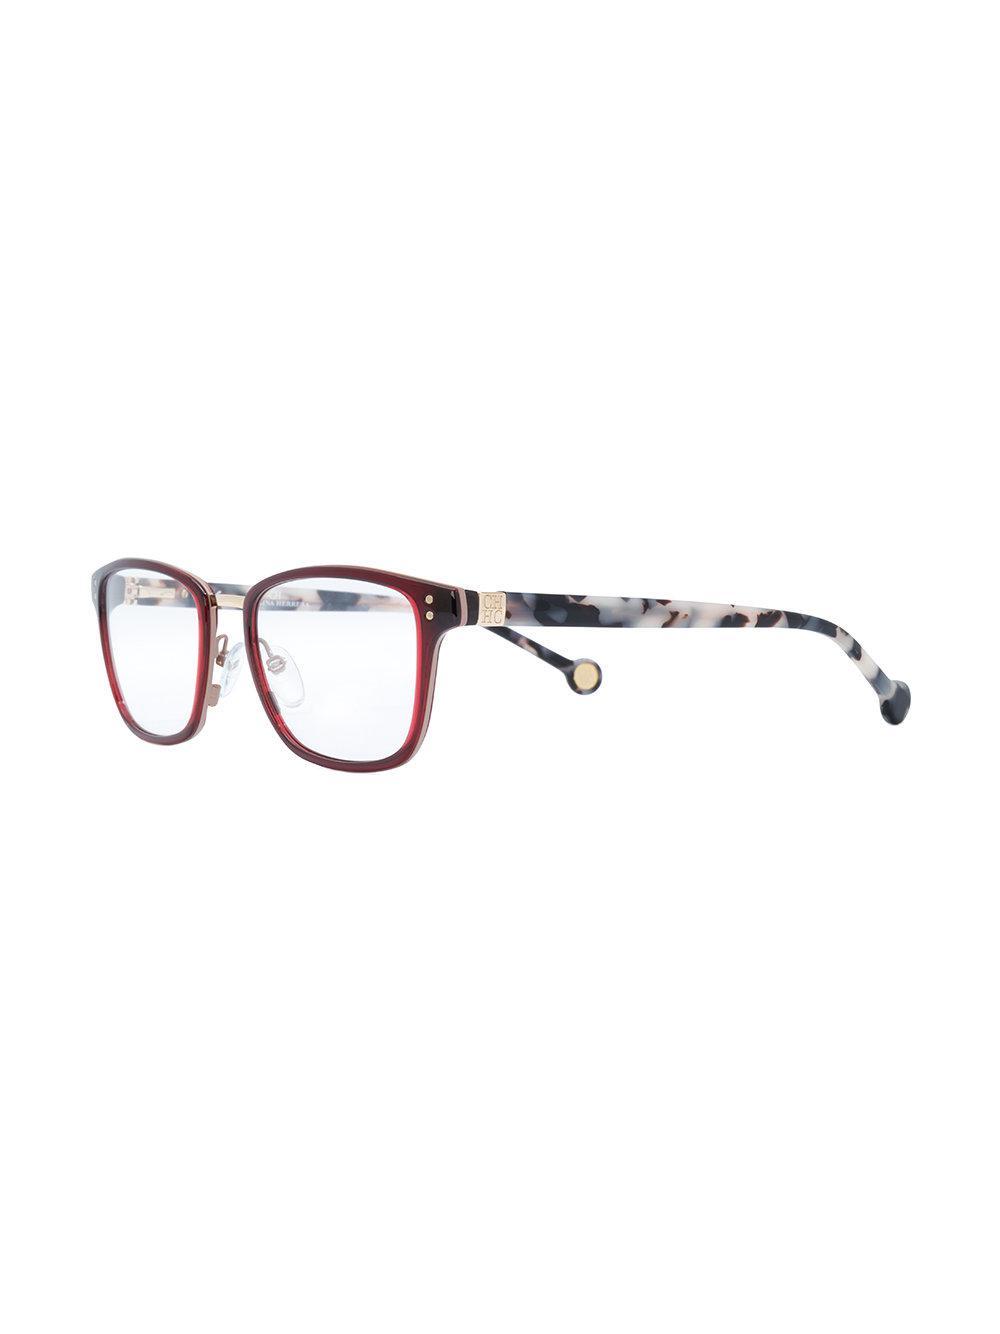 705708f59e CH by Carolina Herrera - Brown Rectangular Shape Glasses - Lyst. View  fullscreen